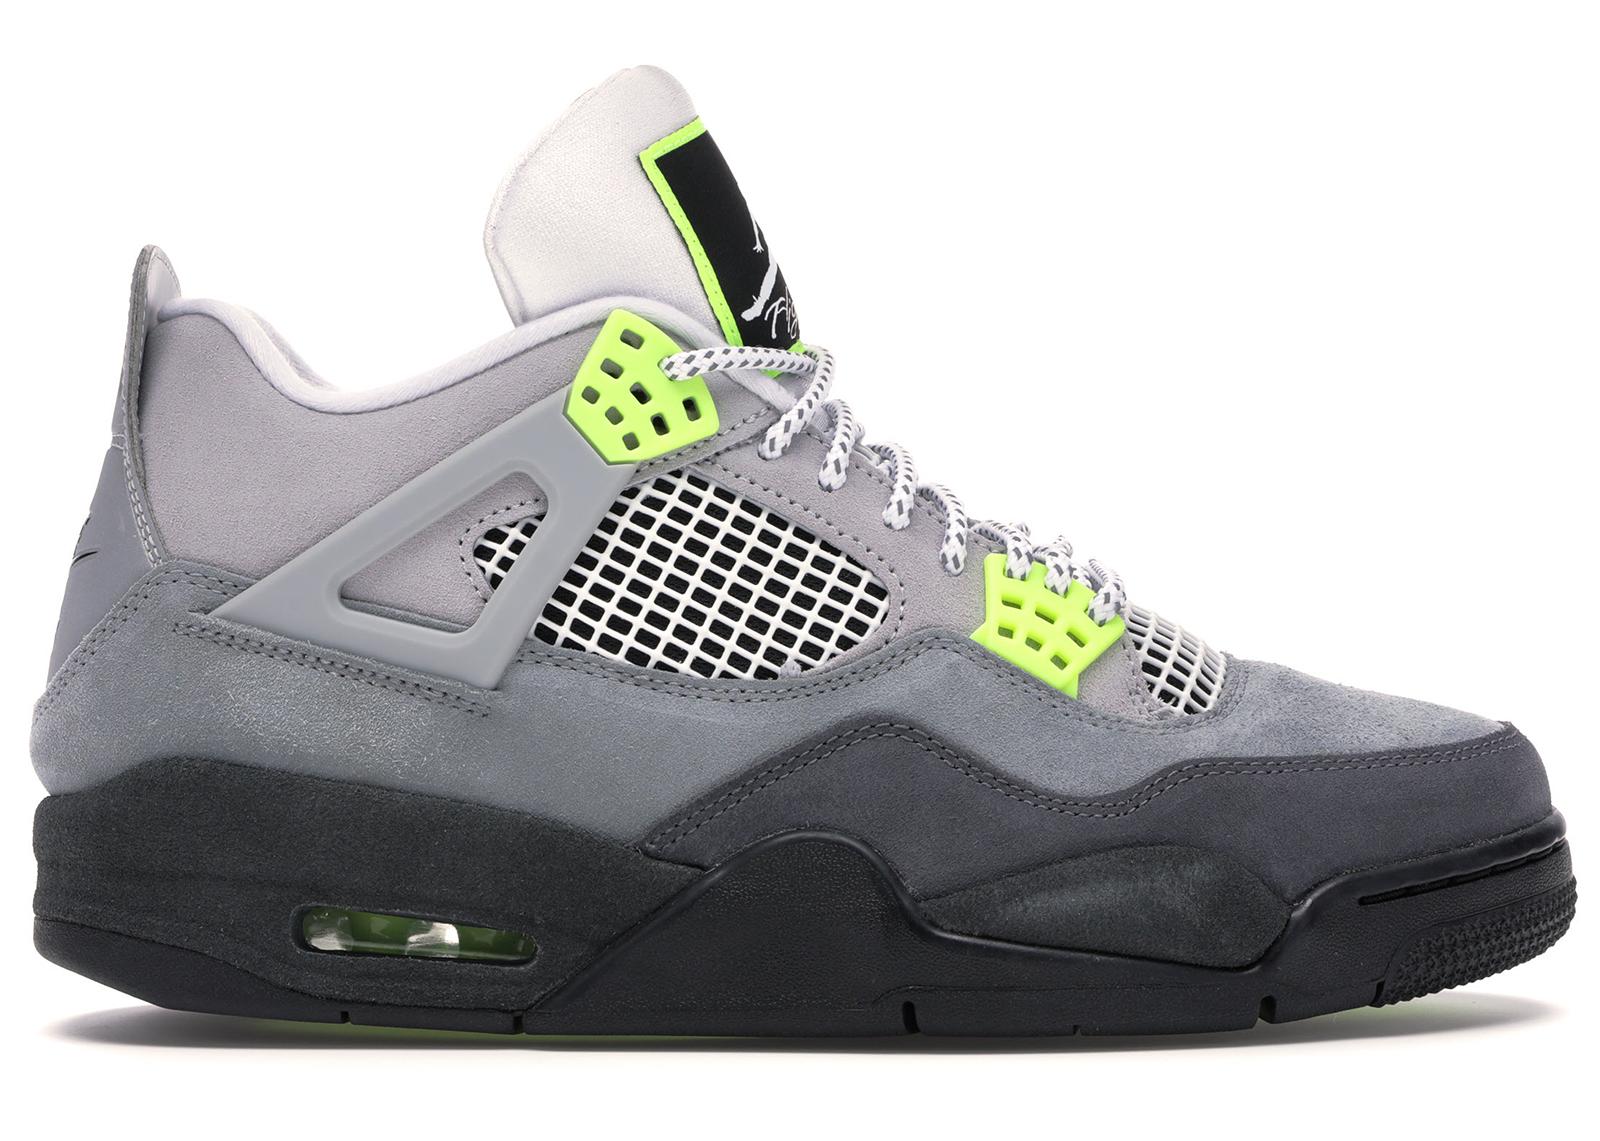 Acheter Air Jordan 4 Chaussures et sneakers neuves